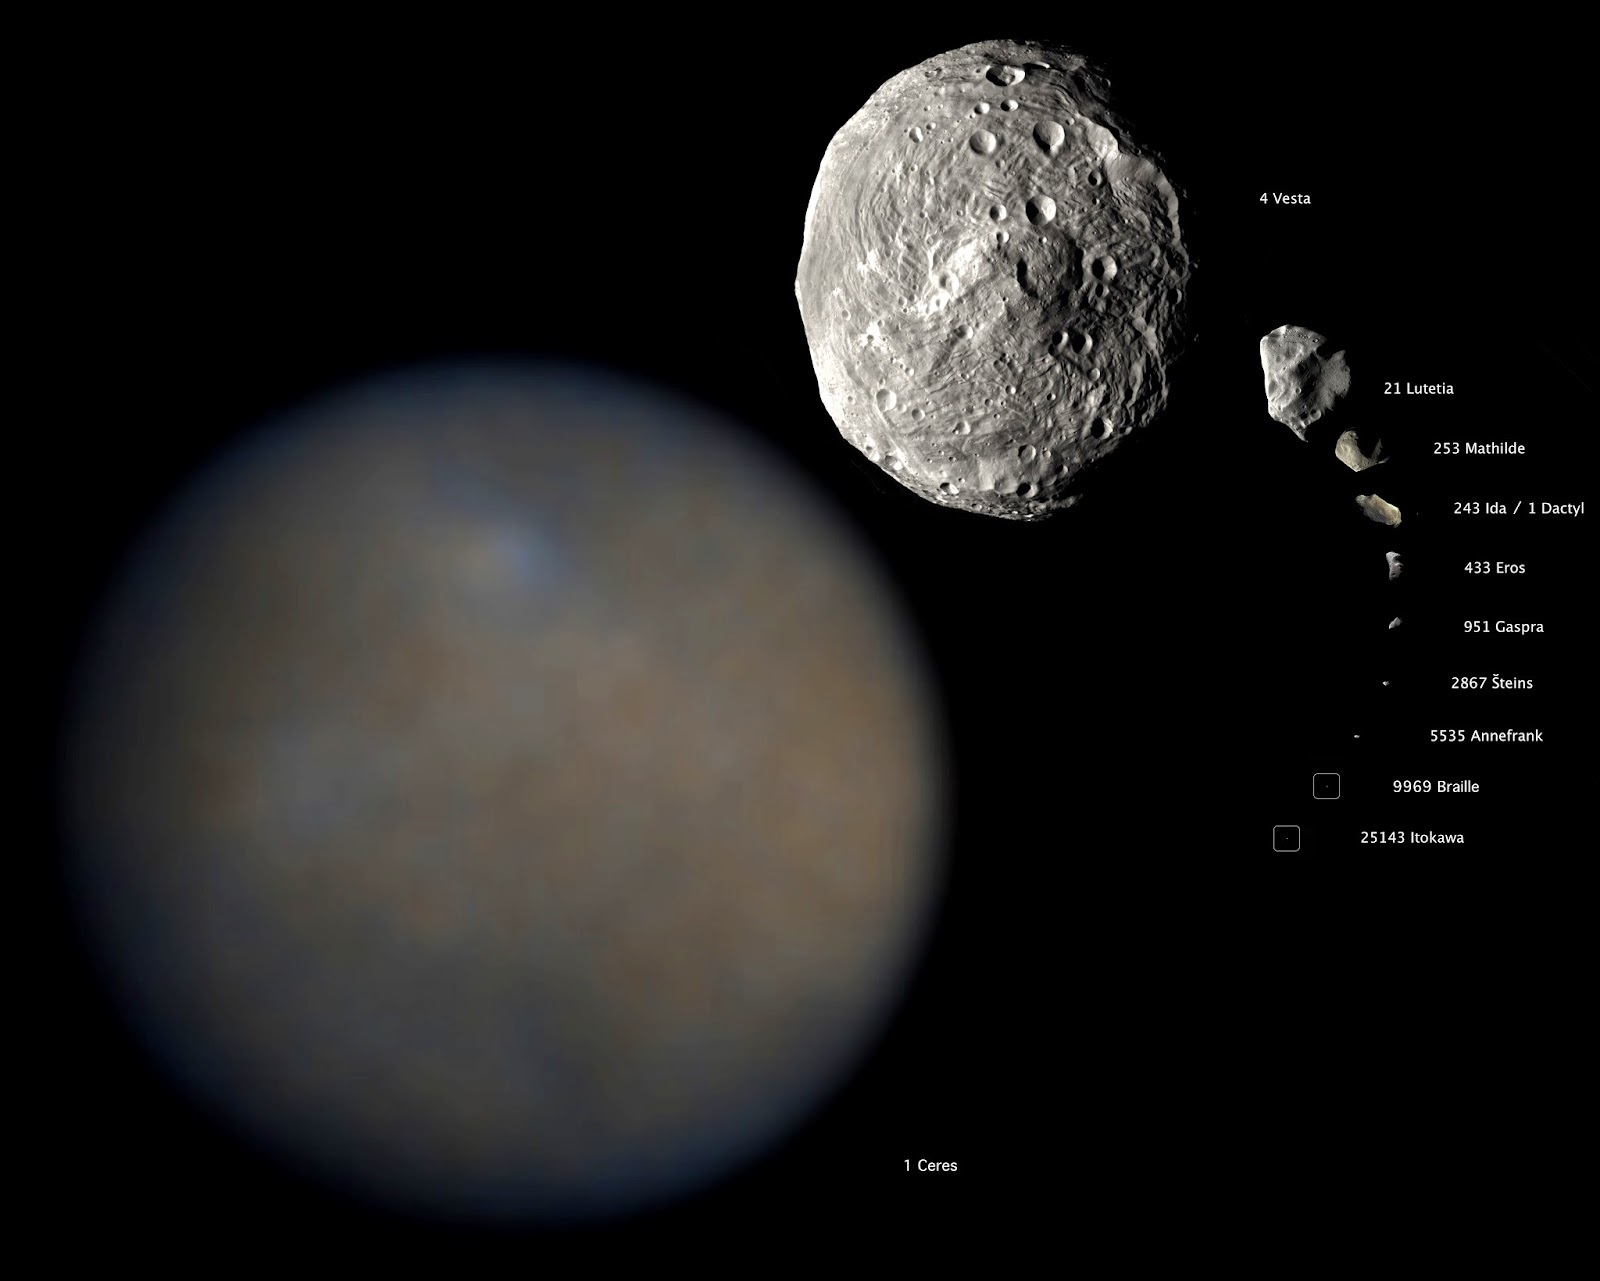 20150115_asteroid-comparison-ps5-ceres